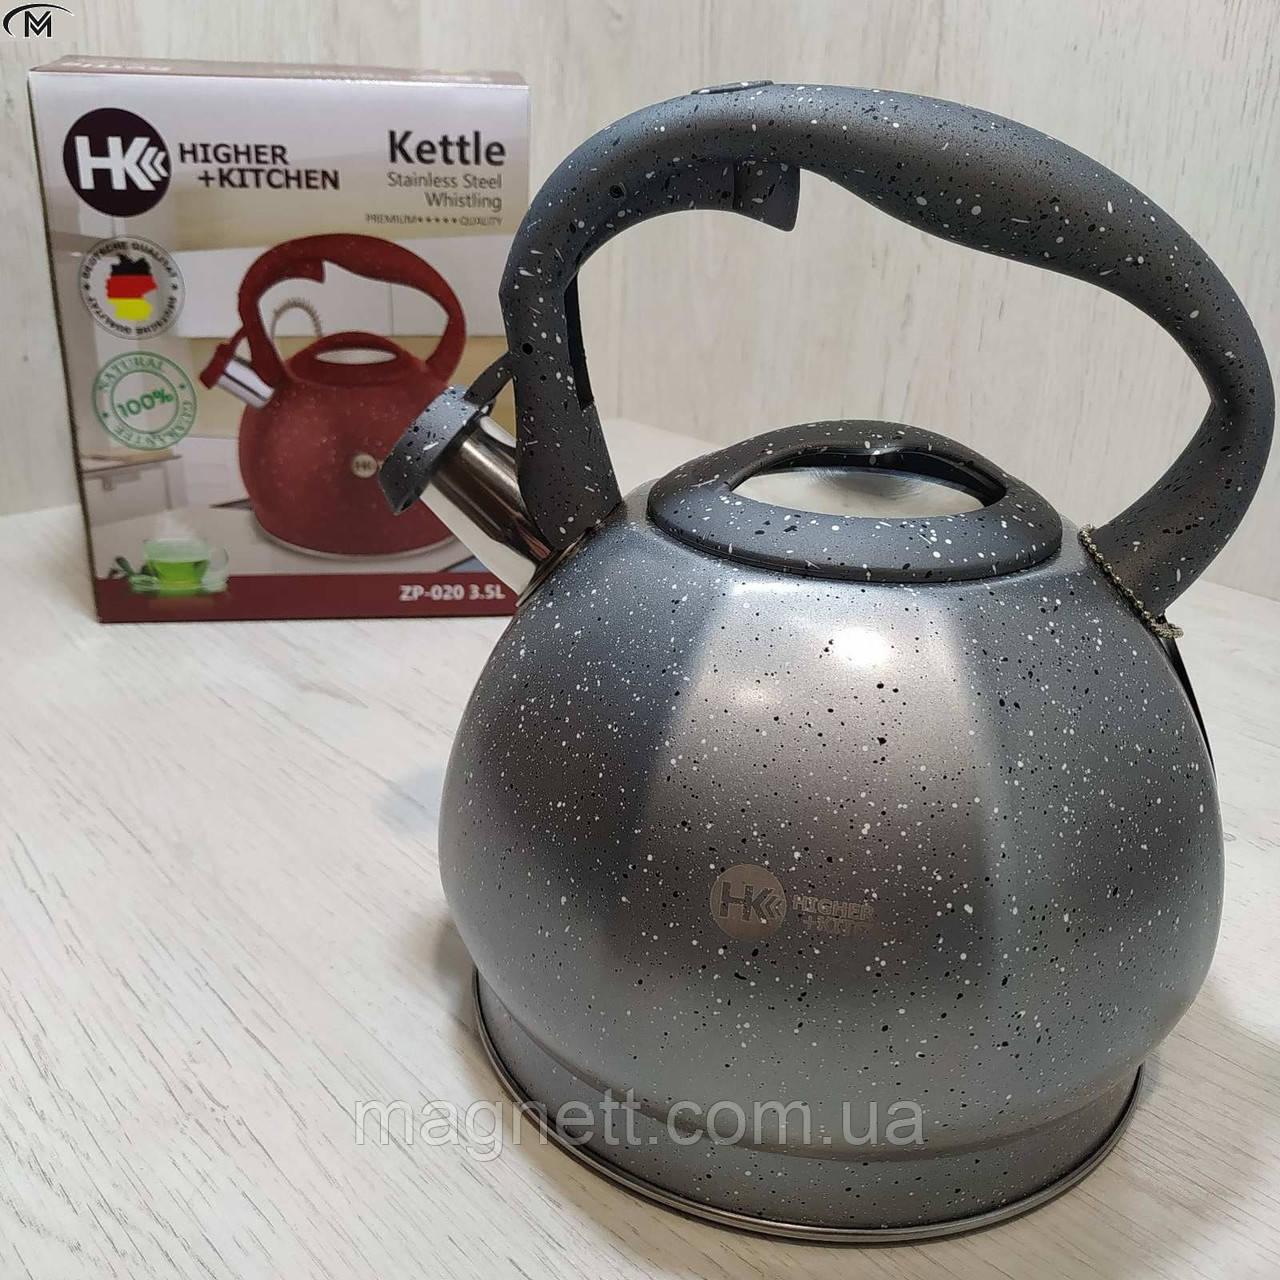 Чайник со свистком HIGHER KITCHEN ZP-020 серый 3.5 л